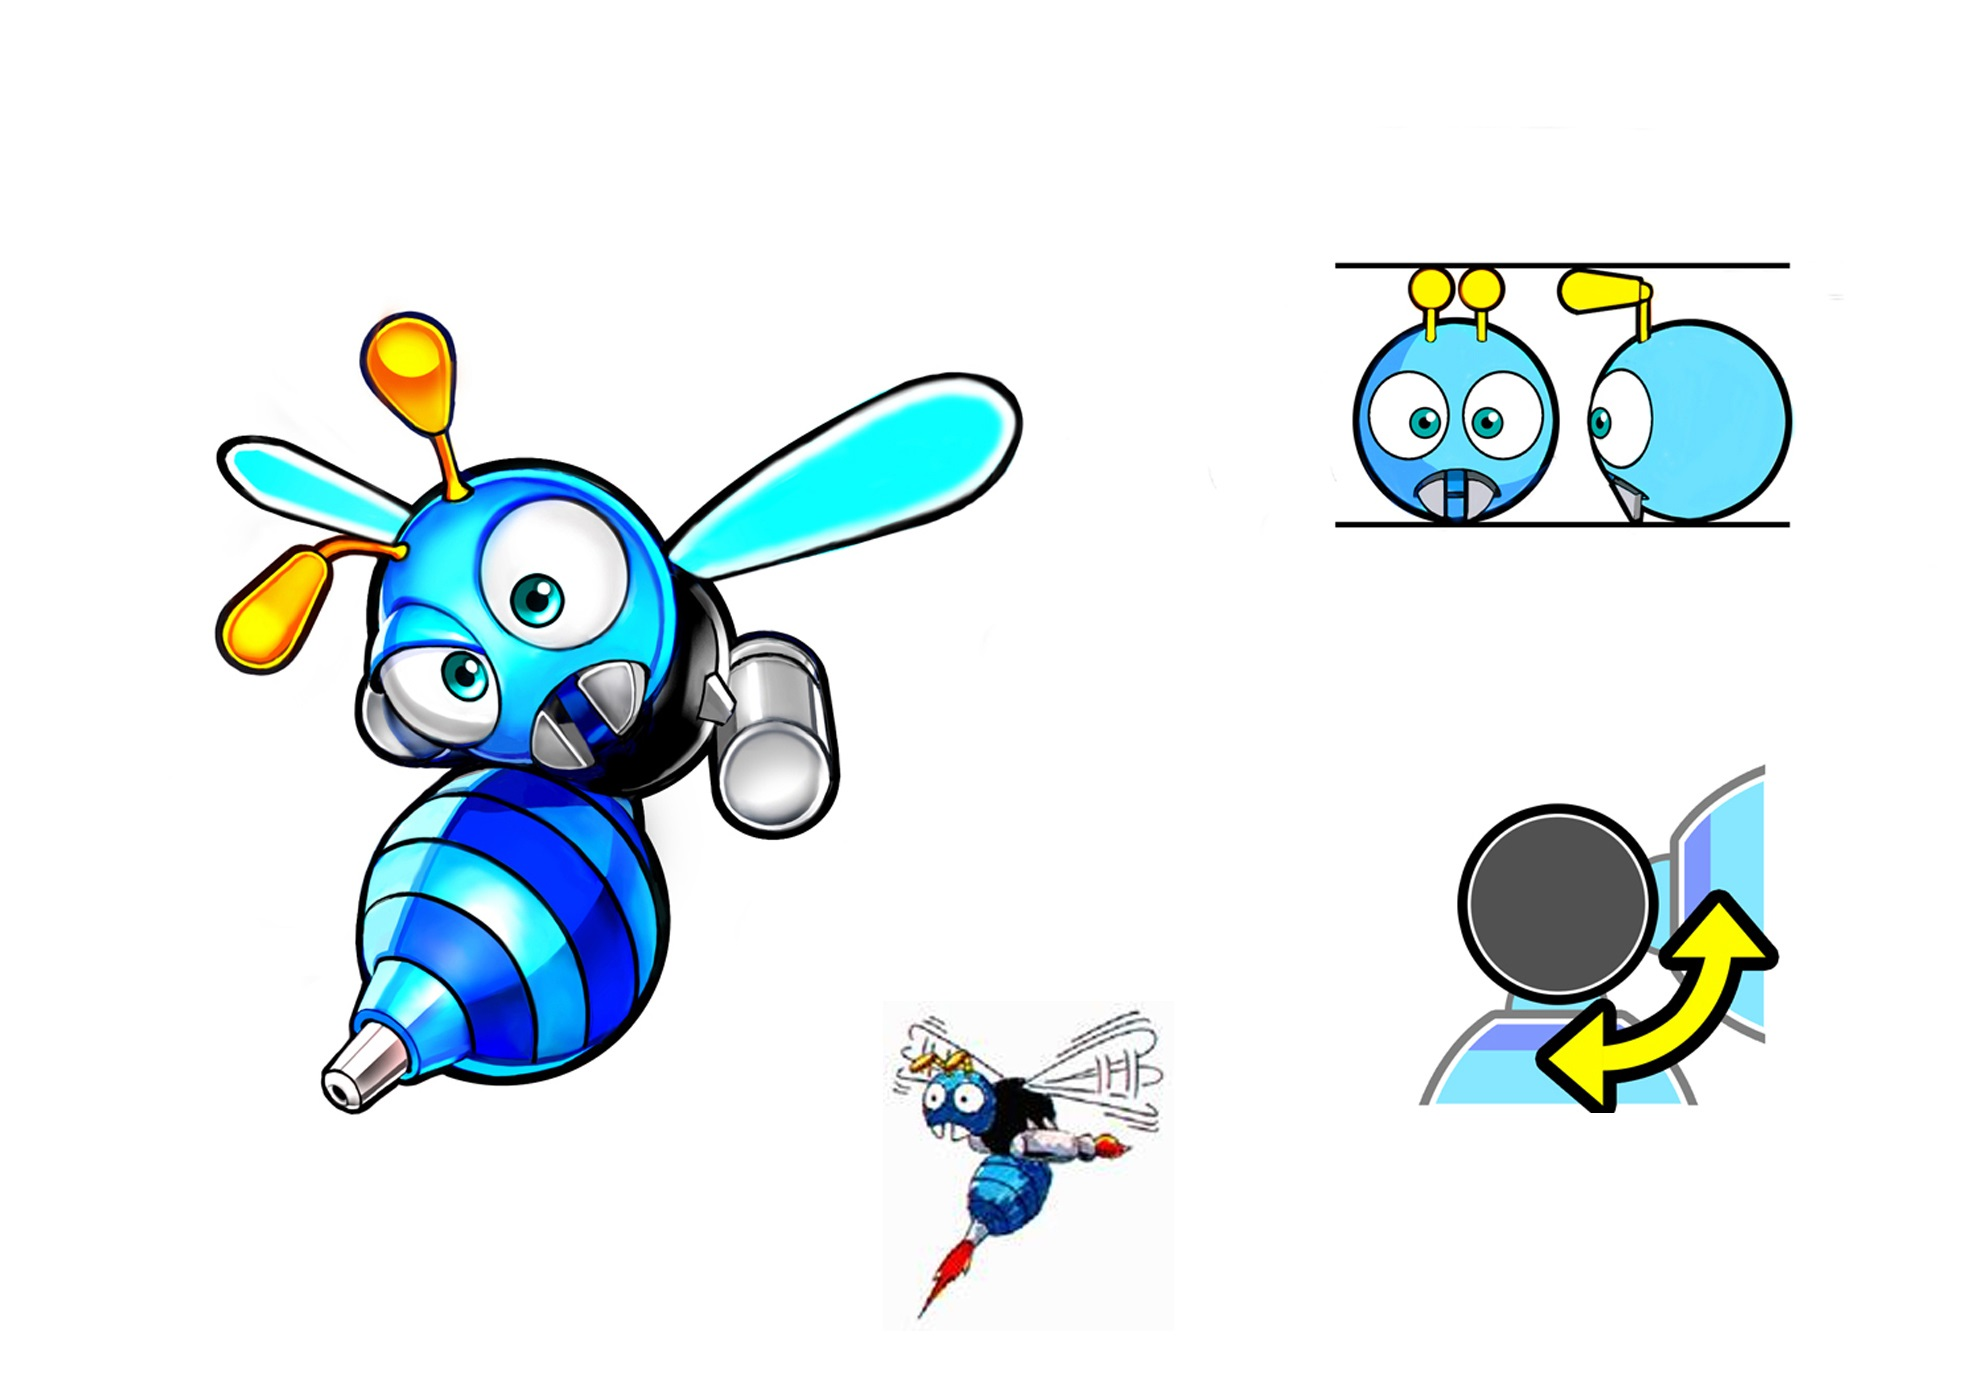 Buzz Bomber/Galeria